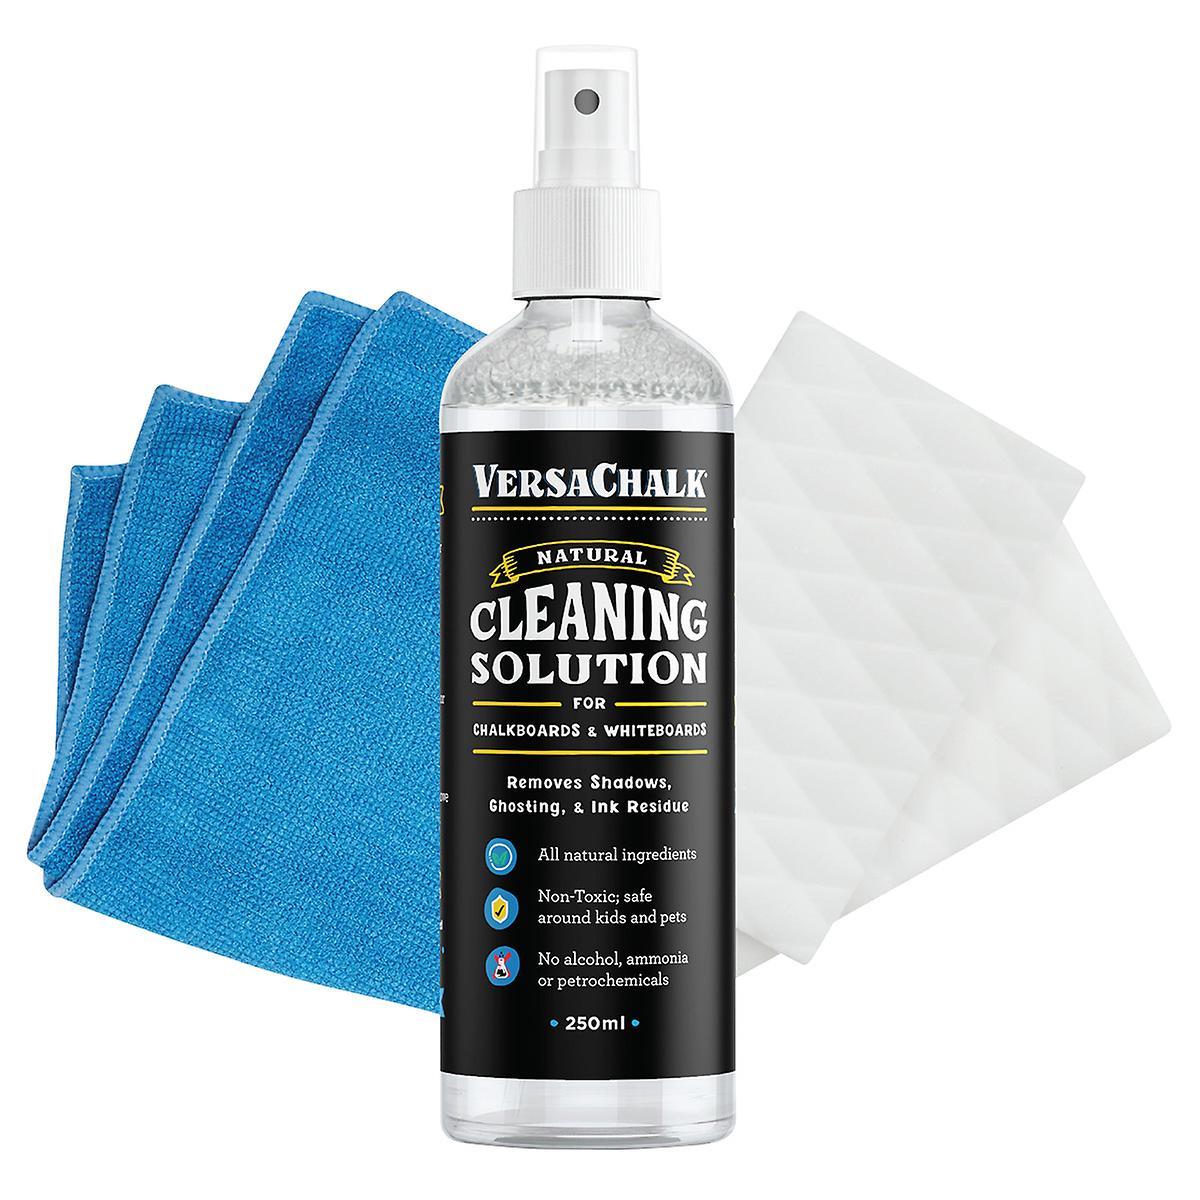 8.4 oz. Chalk & Whiteboard Cleaning Kit